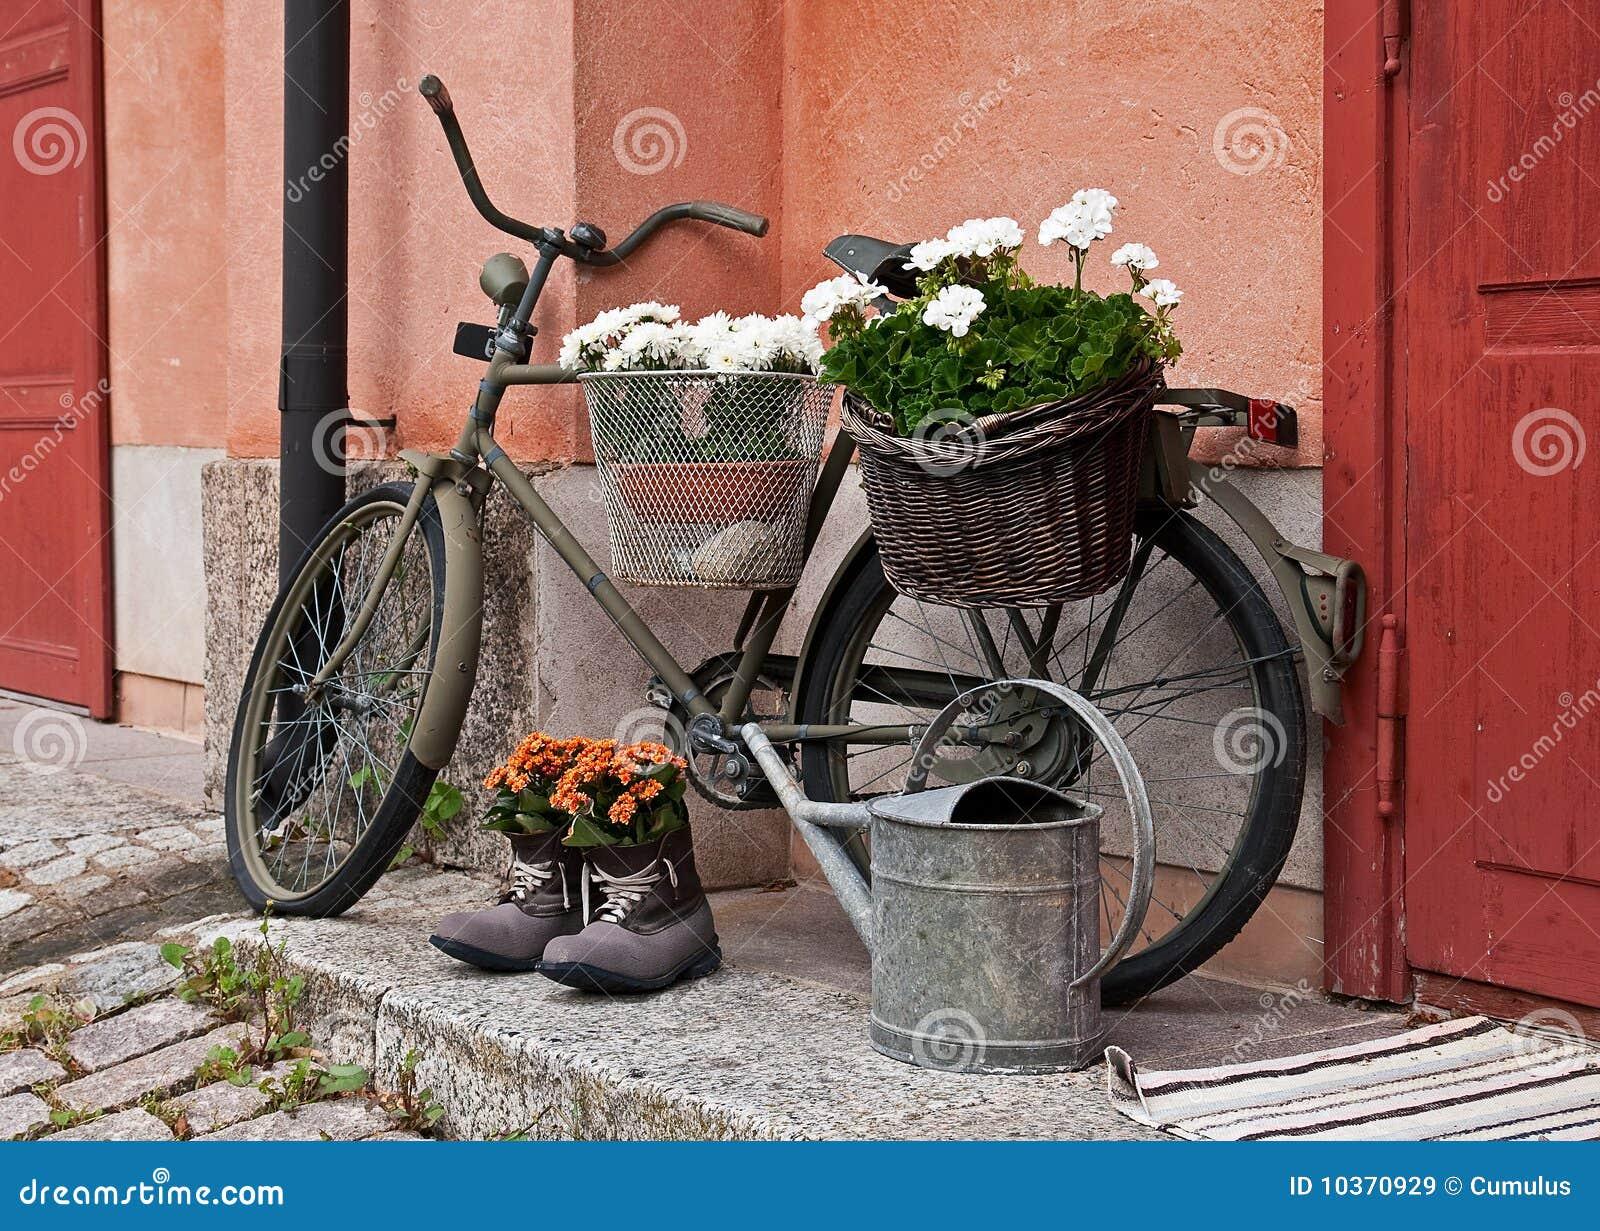 Altes fahrrad stockbild bild von schuhe k rbe dekoration 10370929 - Dekoration fahrrad ...